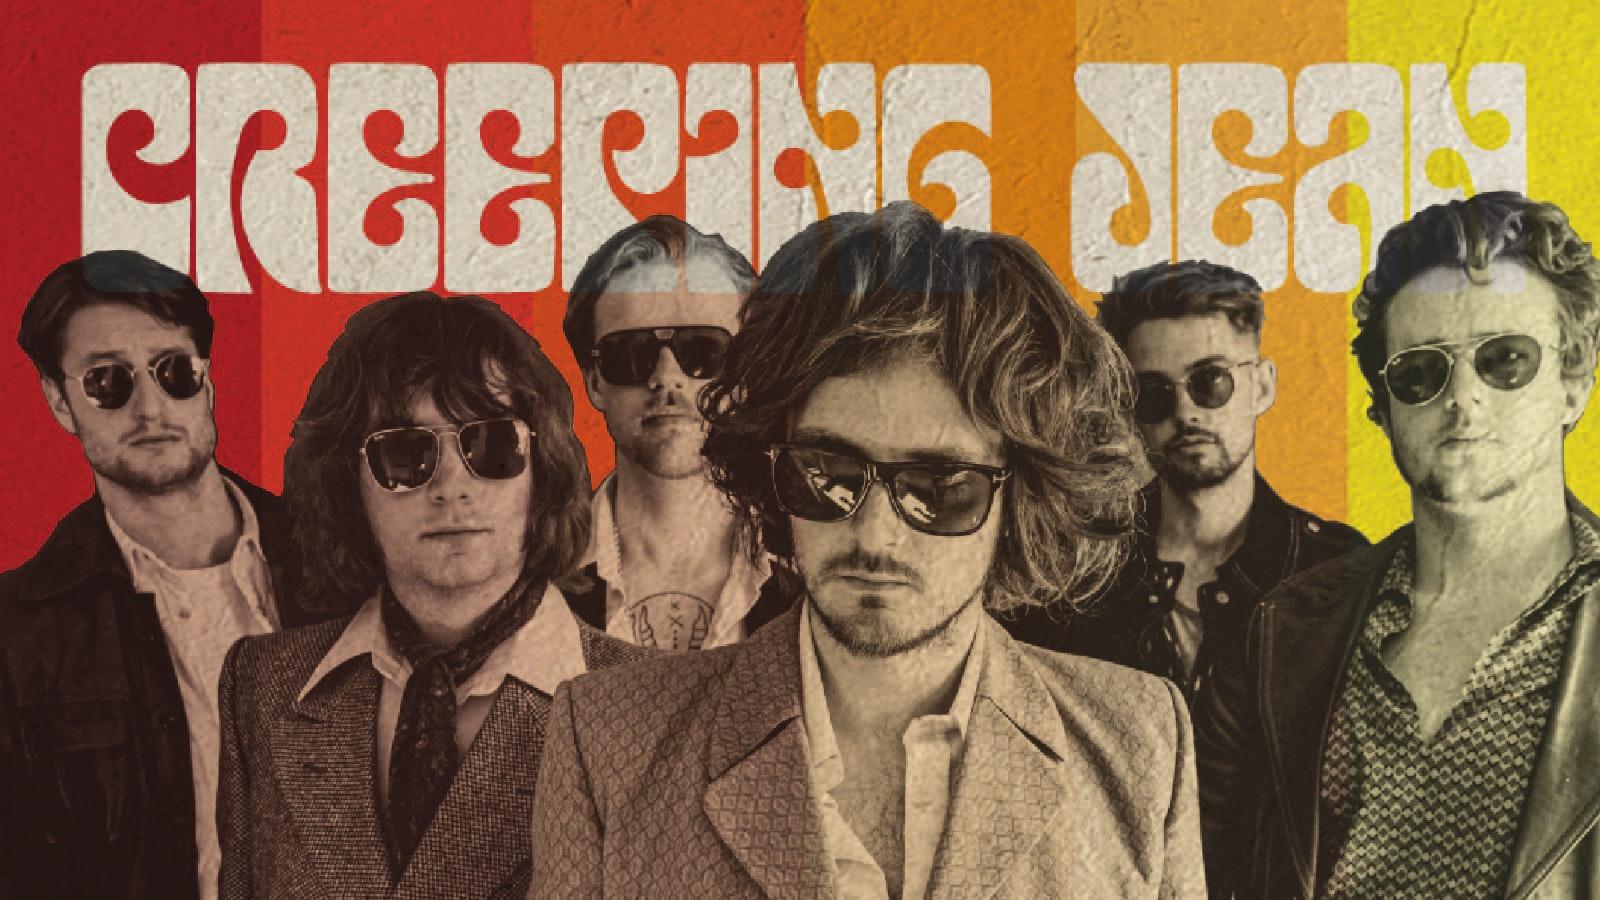 Creeping Jean | Sheffield, Record Junkee